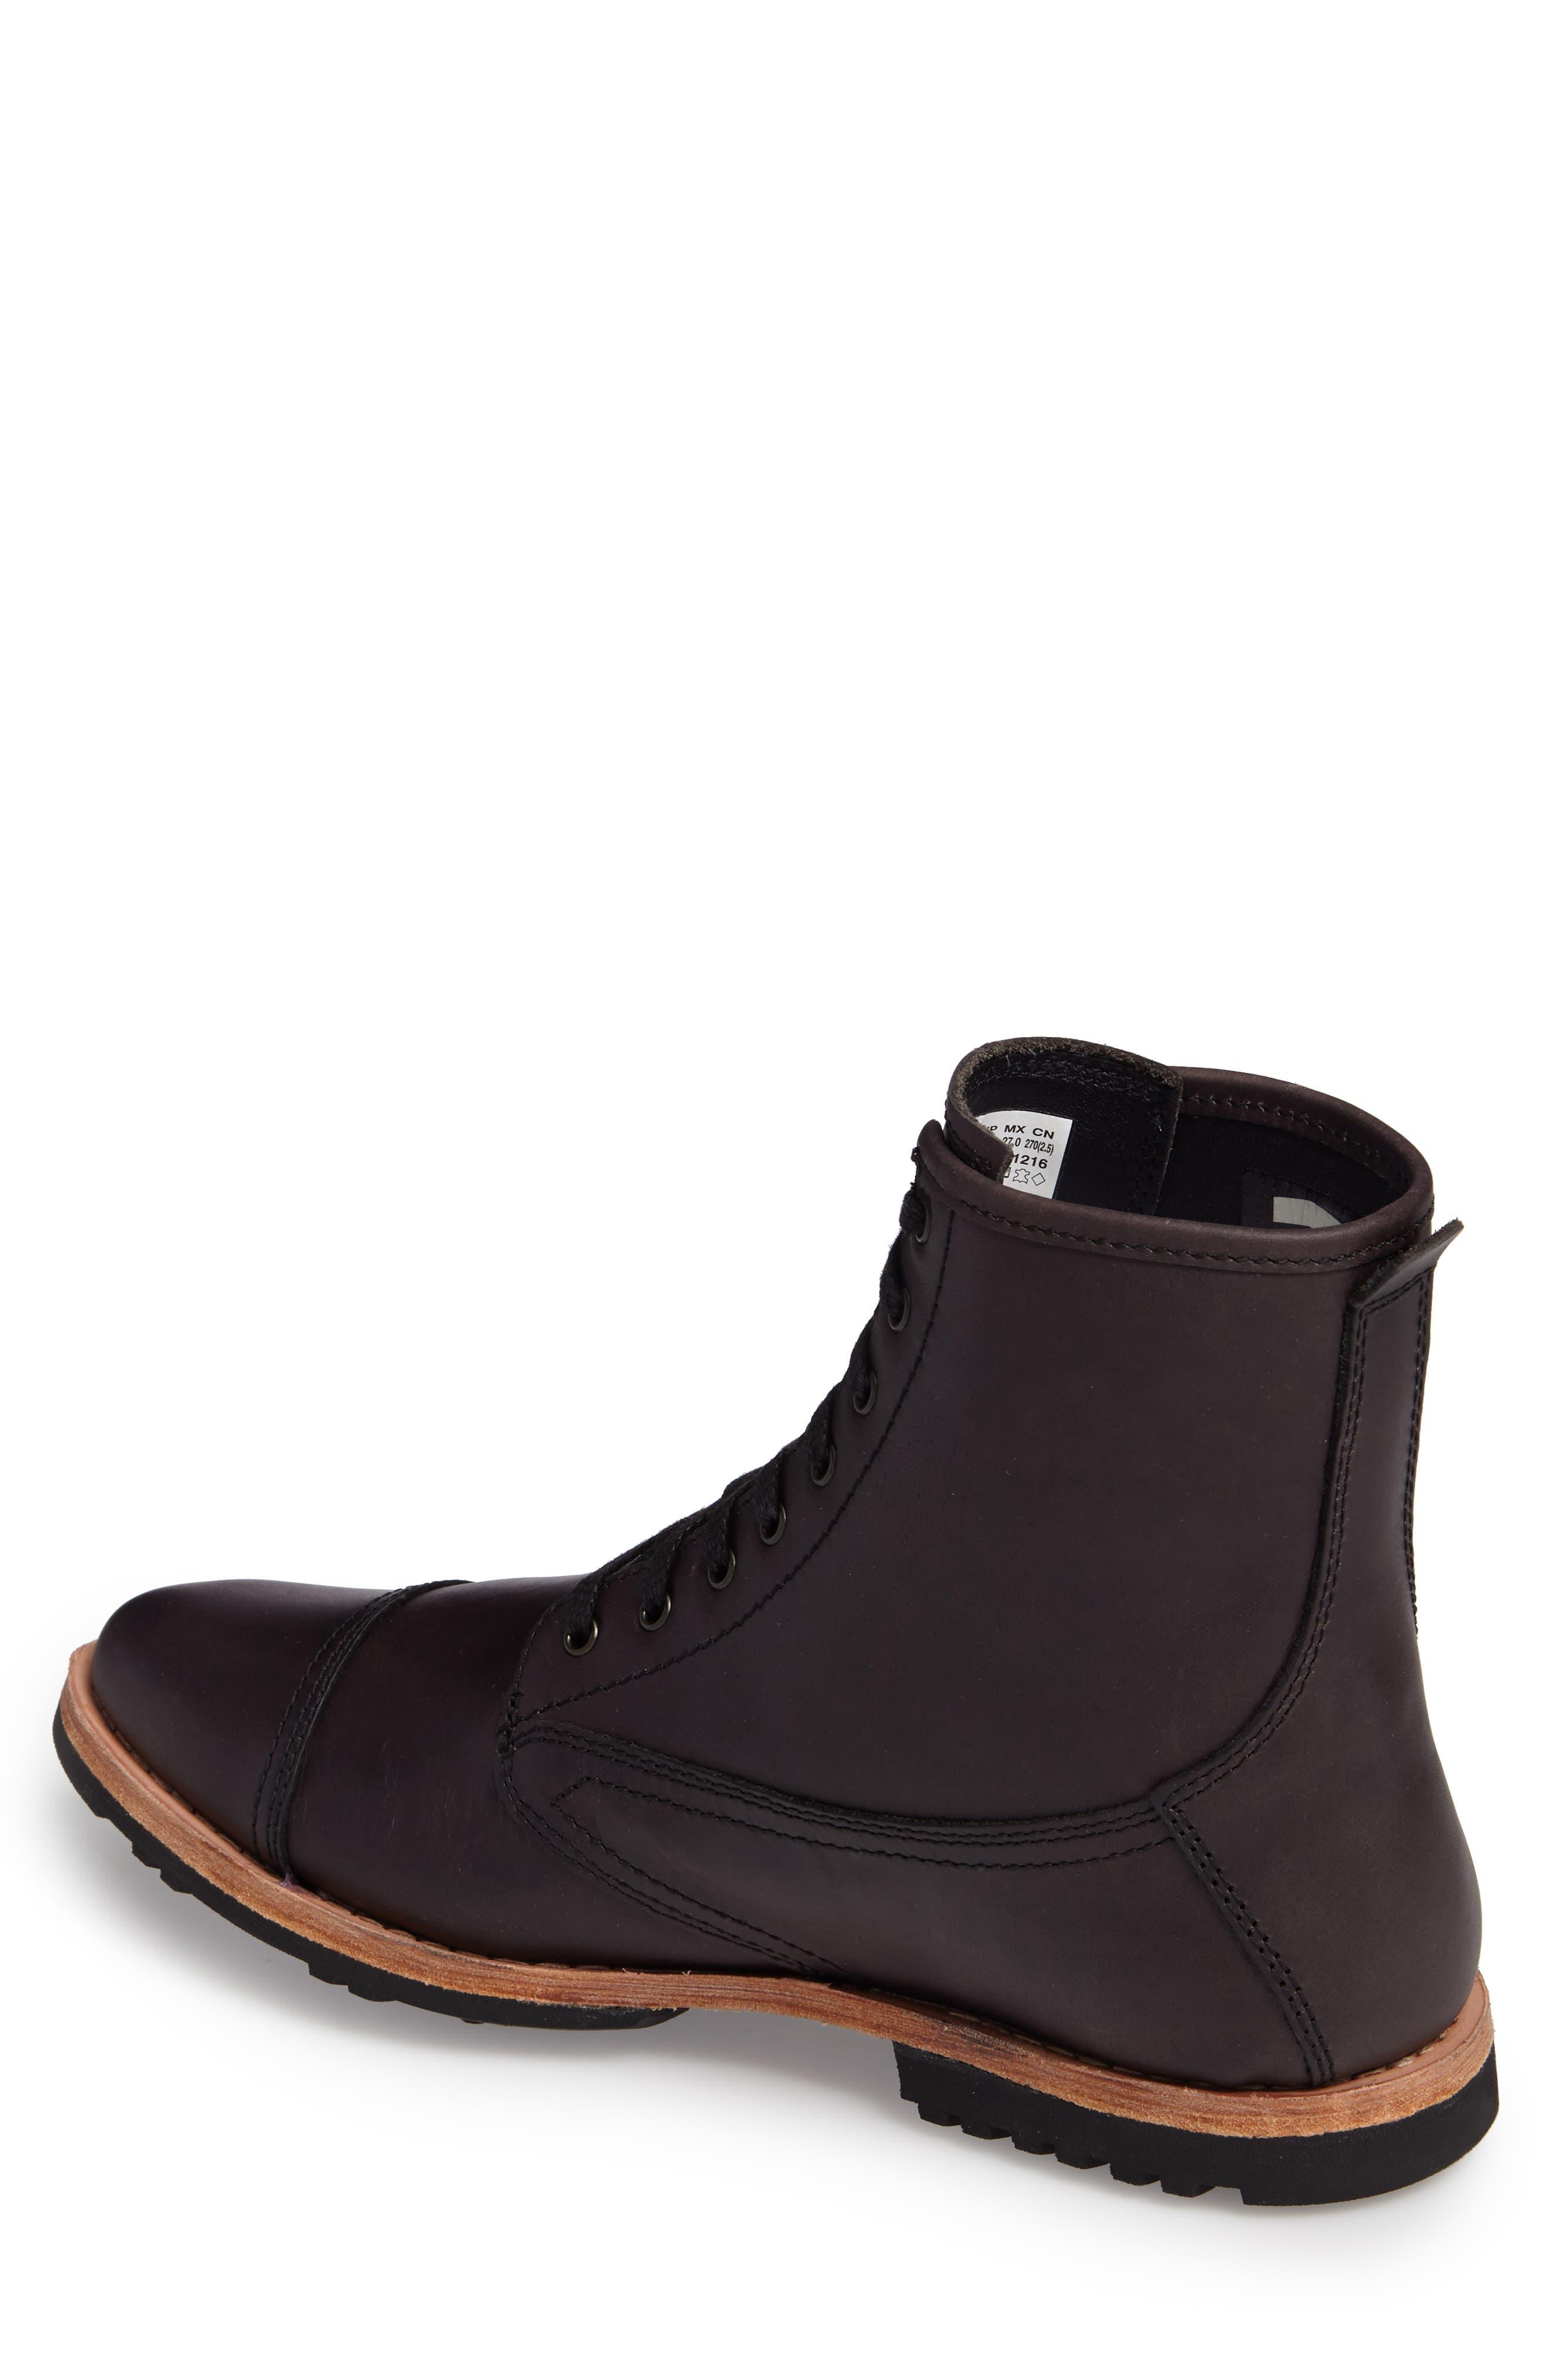 Alternate Image 2  - Timberland 'Bardstown' Cap Toe Boot (Men)